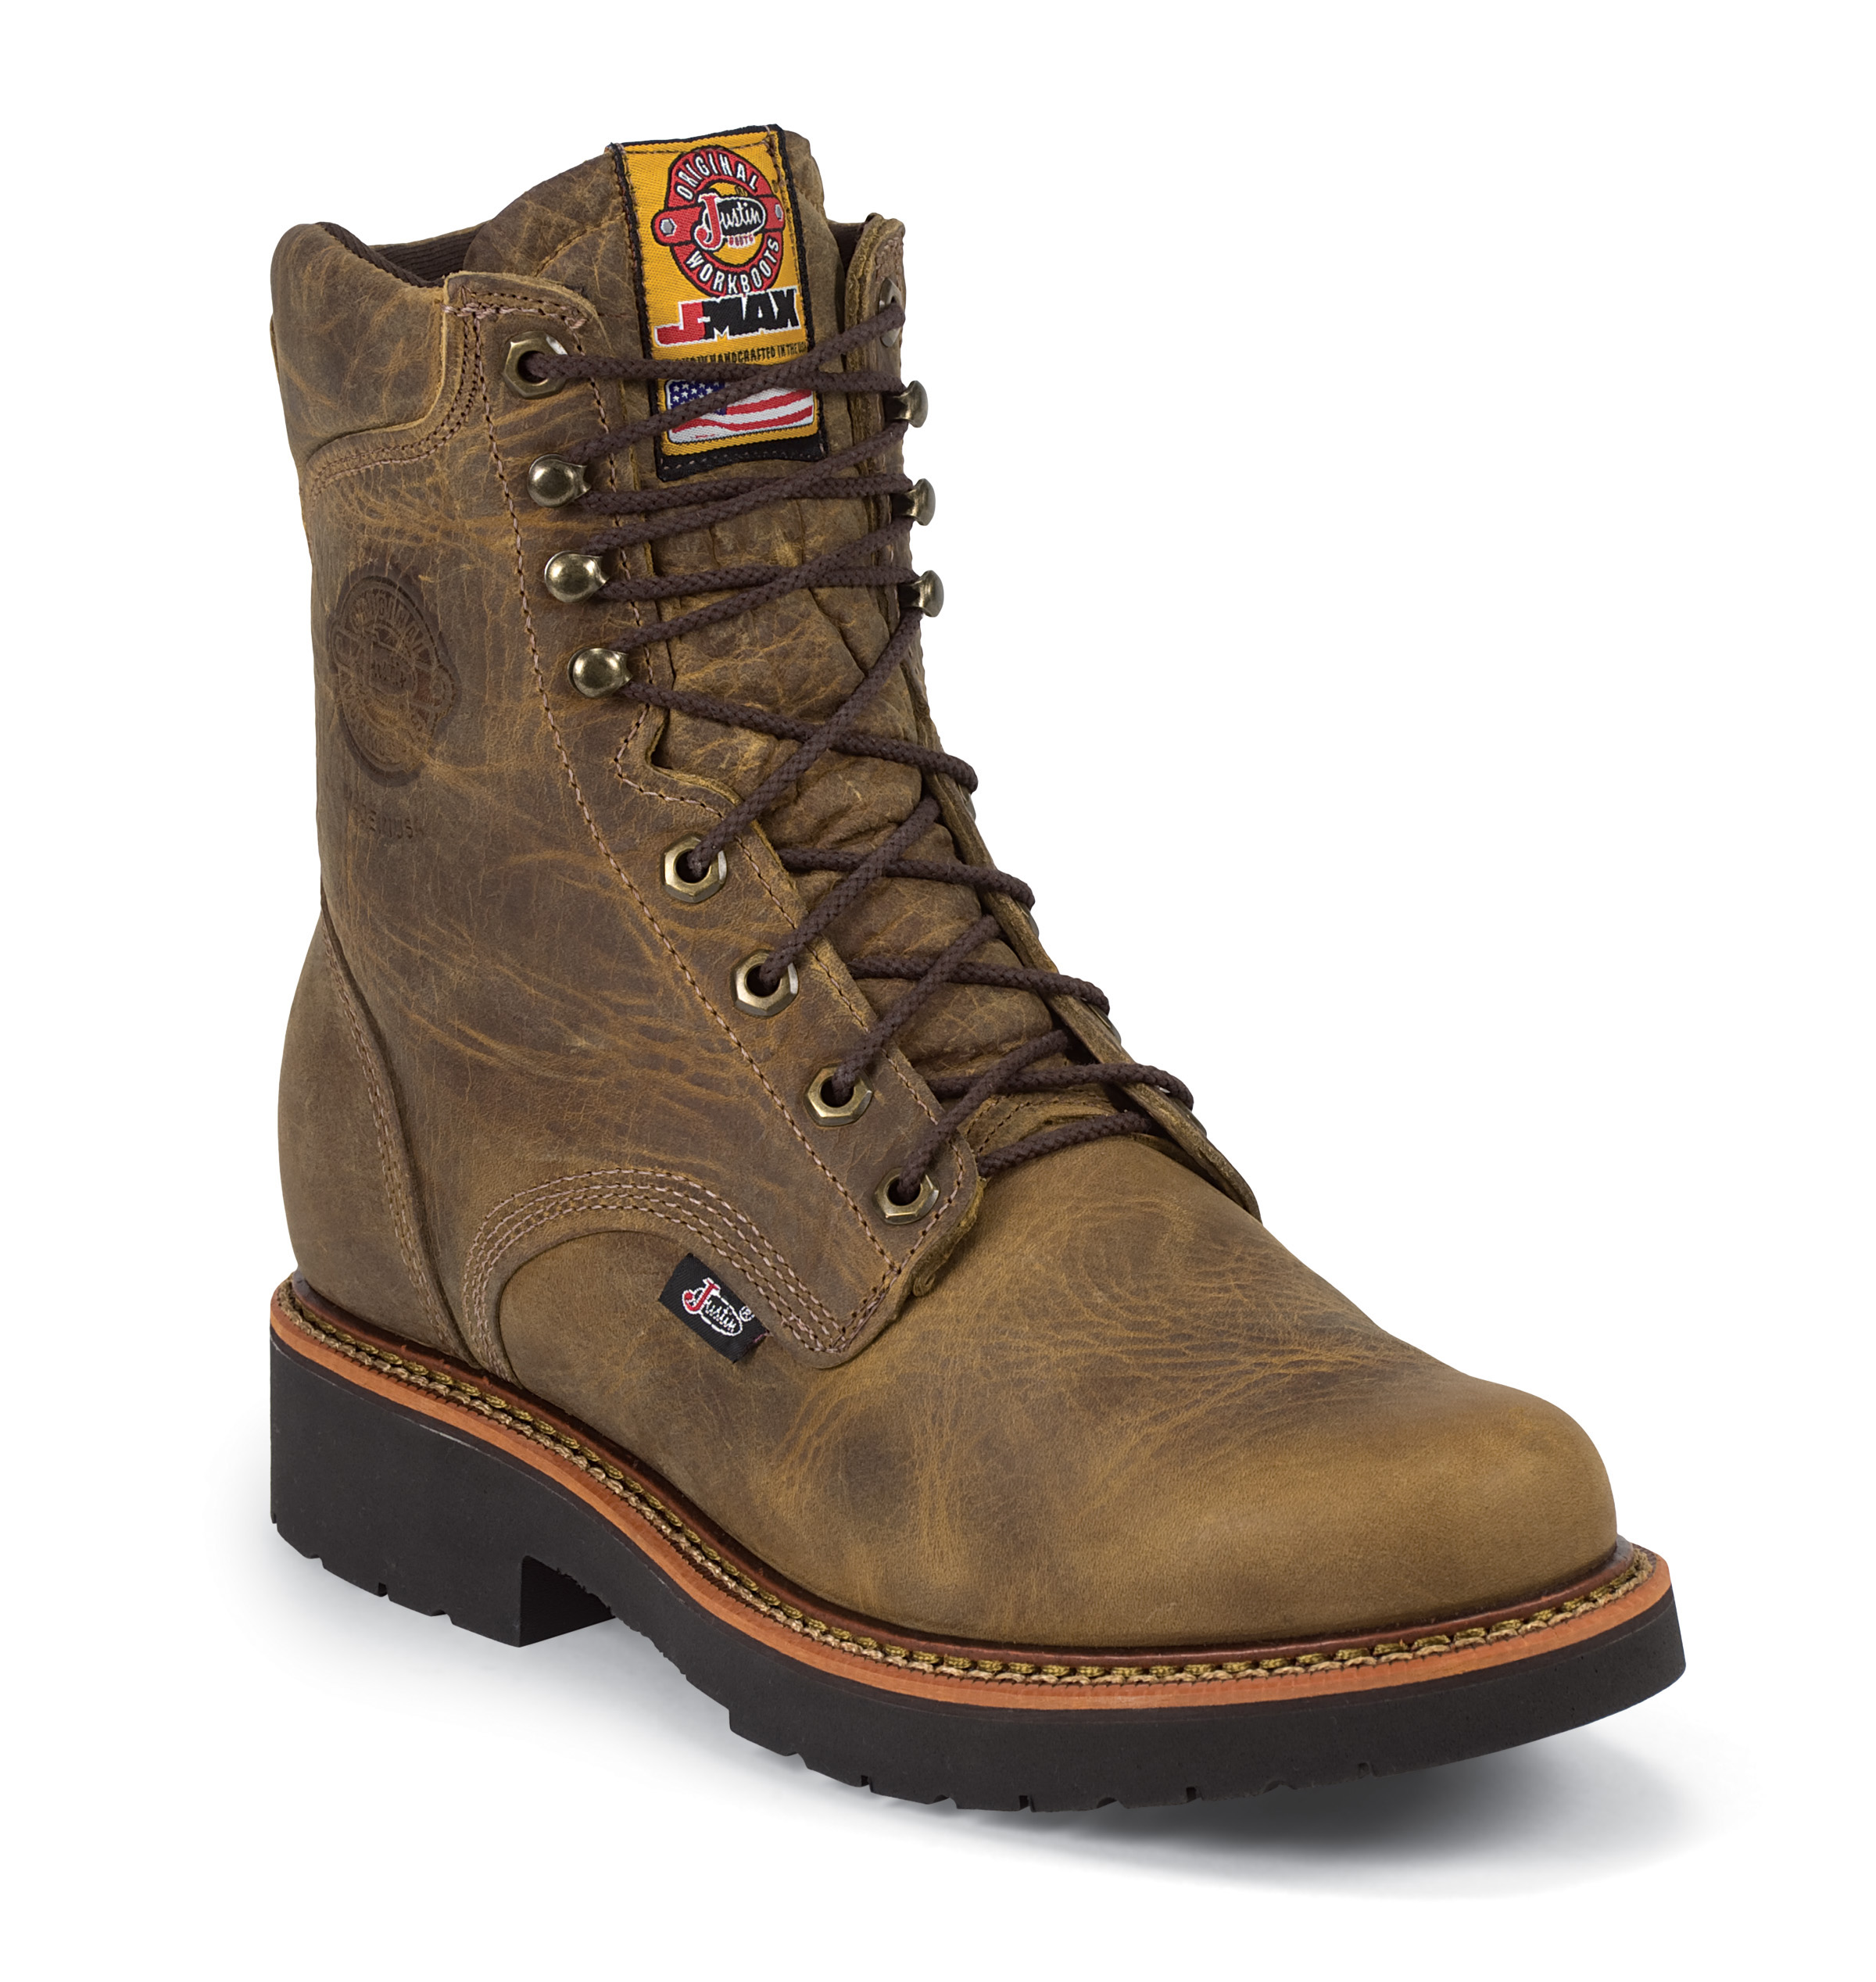 Flights CAT Colorado Mens Boots Mens Footwear Shop Mens Footwear COLOUR-brown